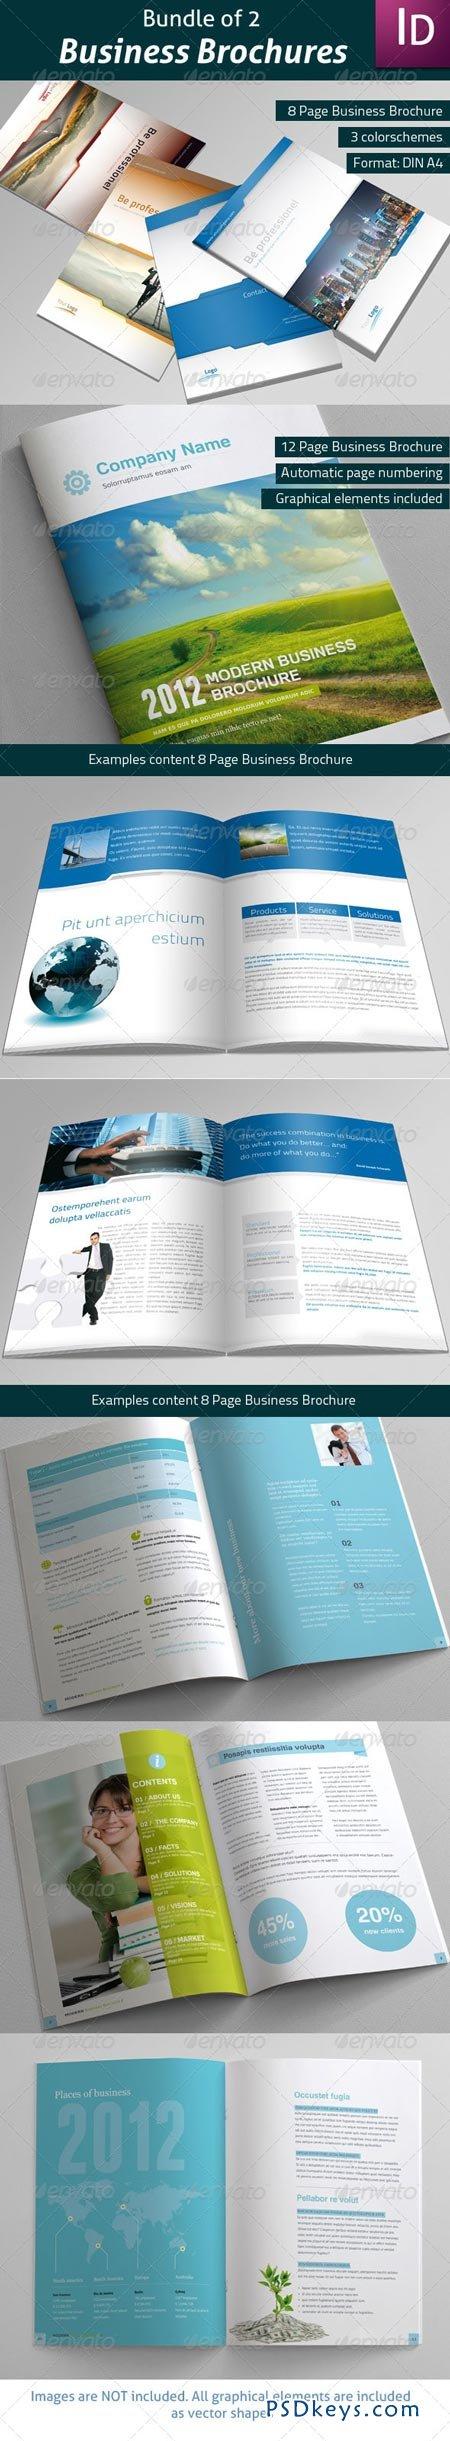 Bundle of 2 Business Brochures 3477908